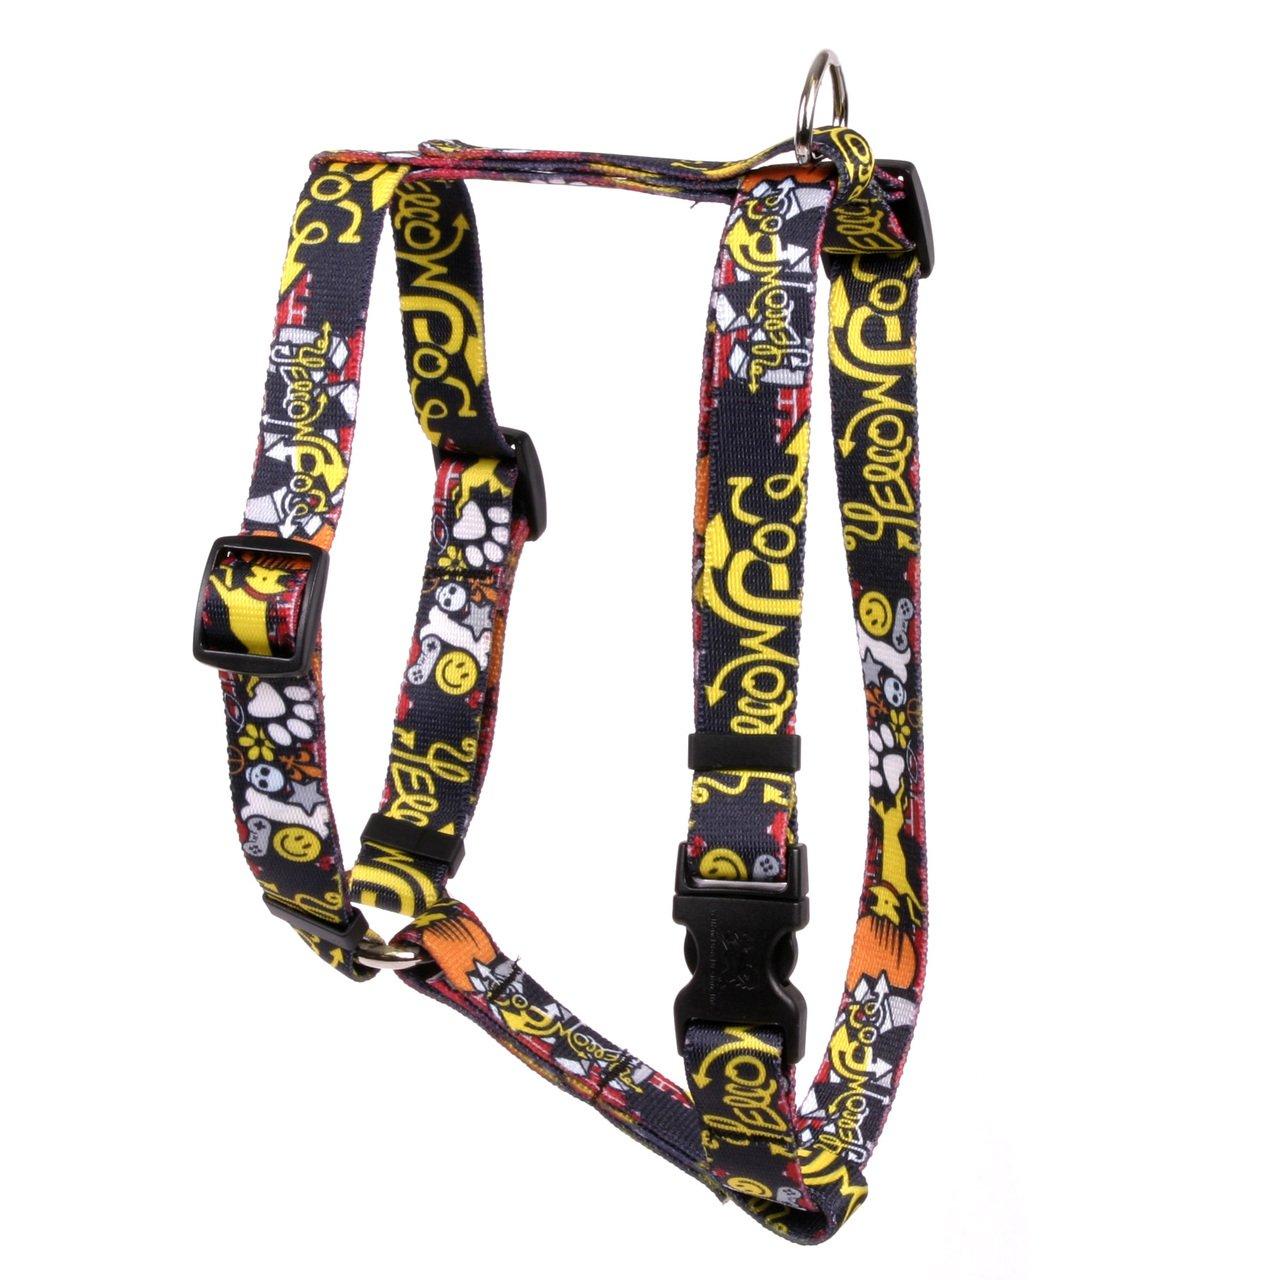 Yellow Dog Design Graffiti Dog Roman Style H Dog Harness, Small/Medium